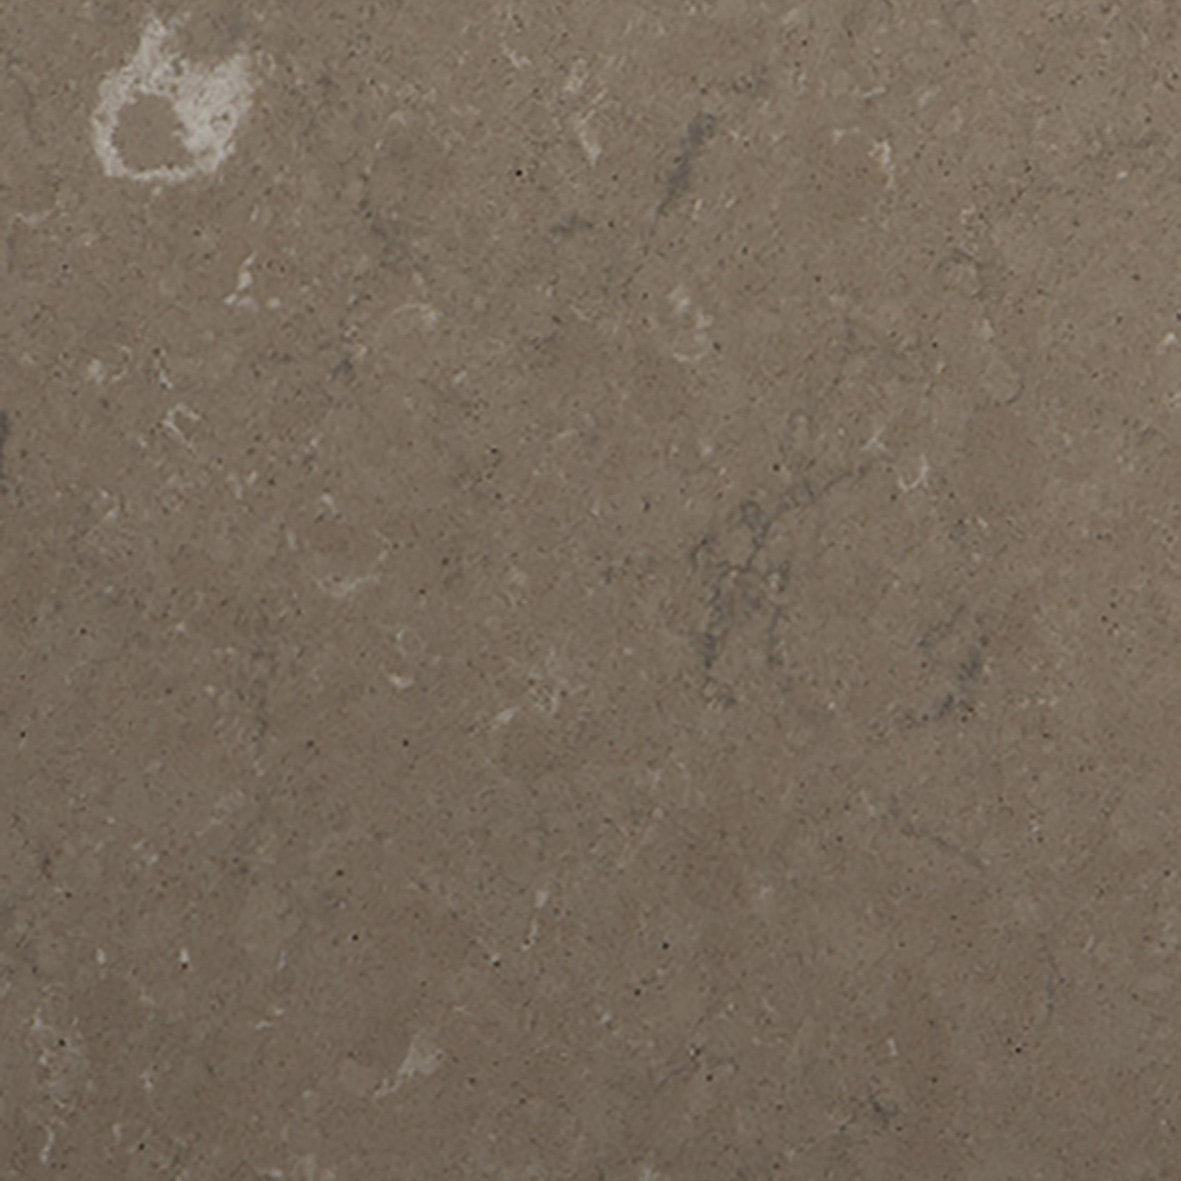 Coral Clay coloured Silestone Quartz kitchen worktop surfaces